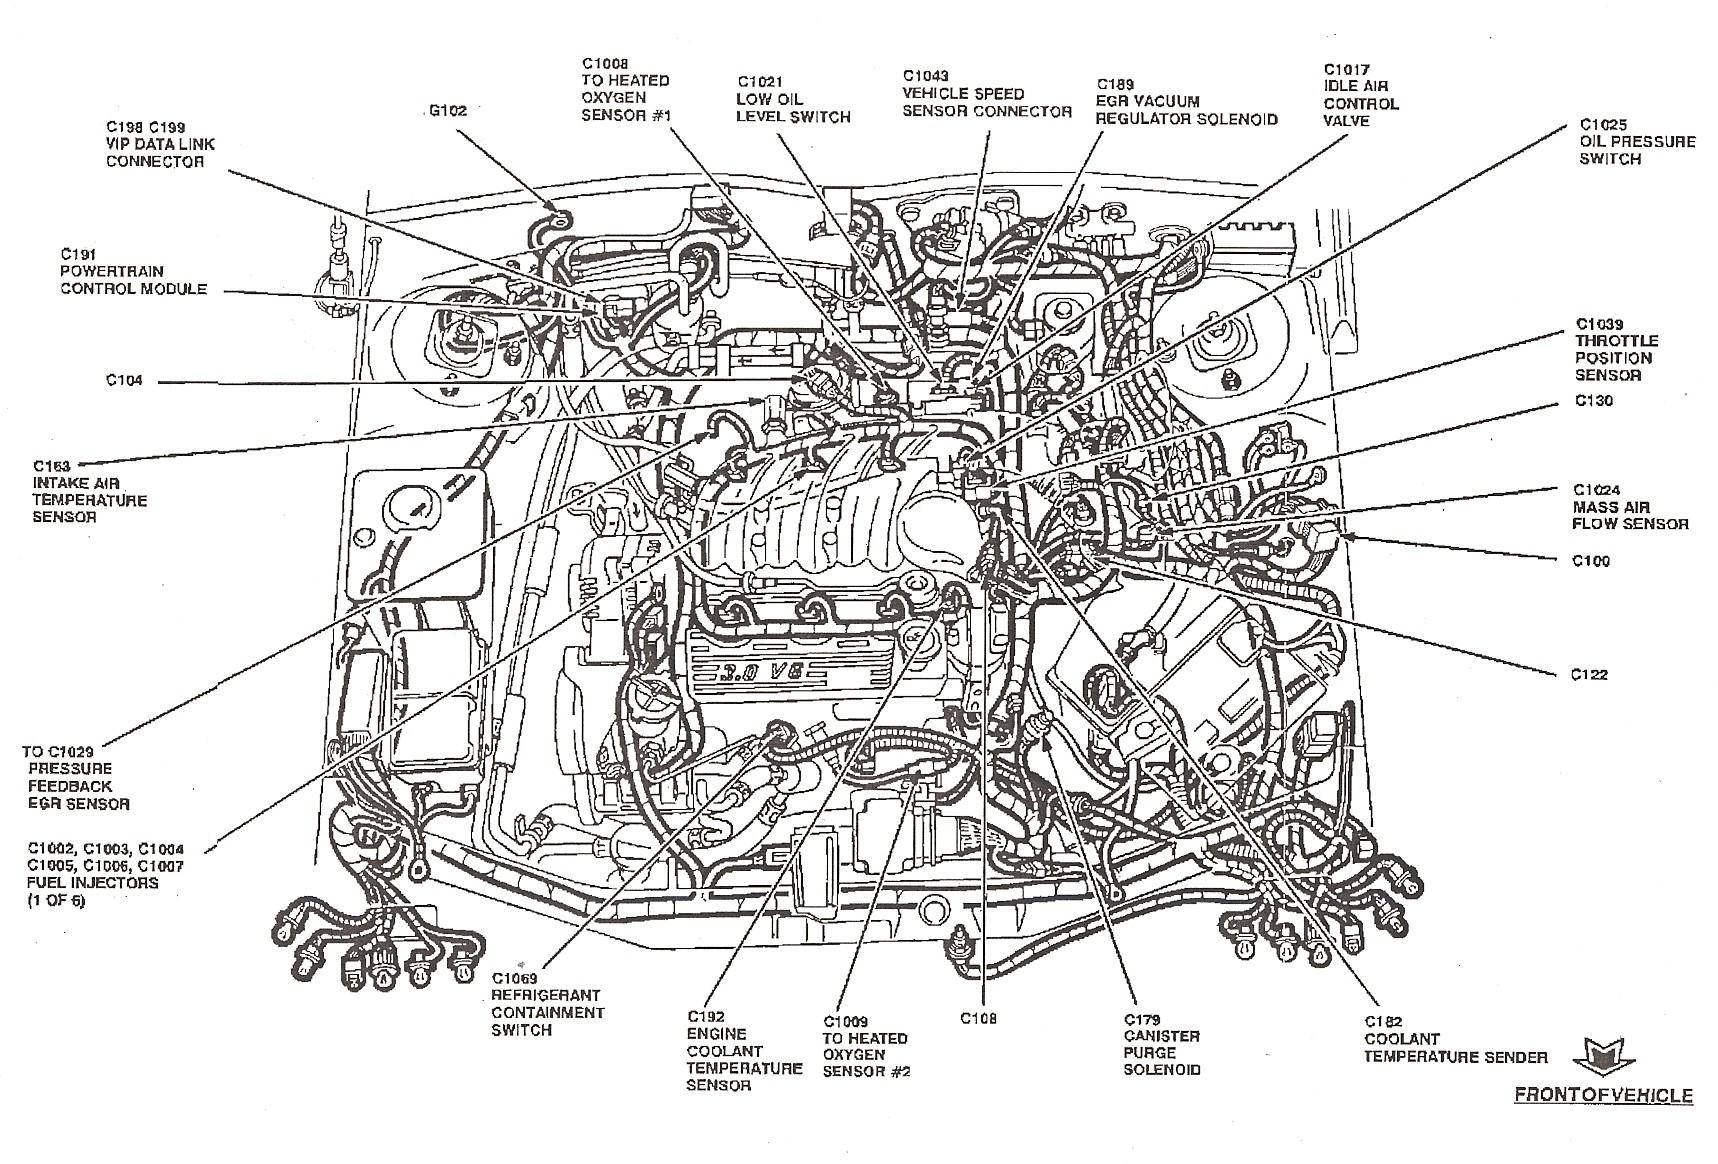 Ford Explorer Parts Diagram Zetec Engine Diagram Vacuum Wiring Wiring Diagrams Instructions Of Ford Explorer Parts Diagram